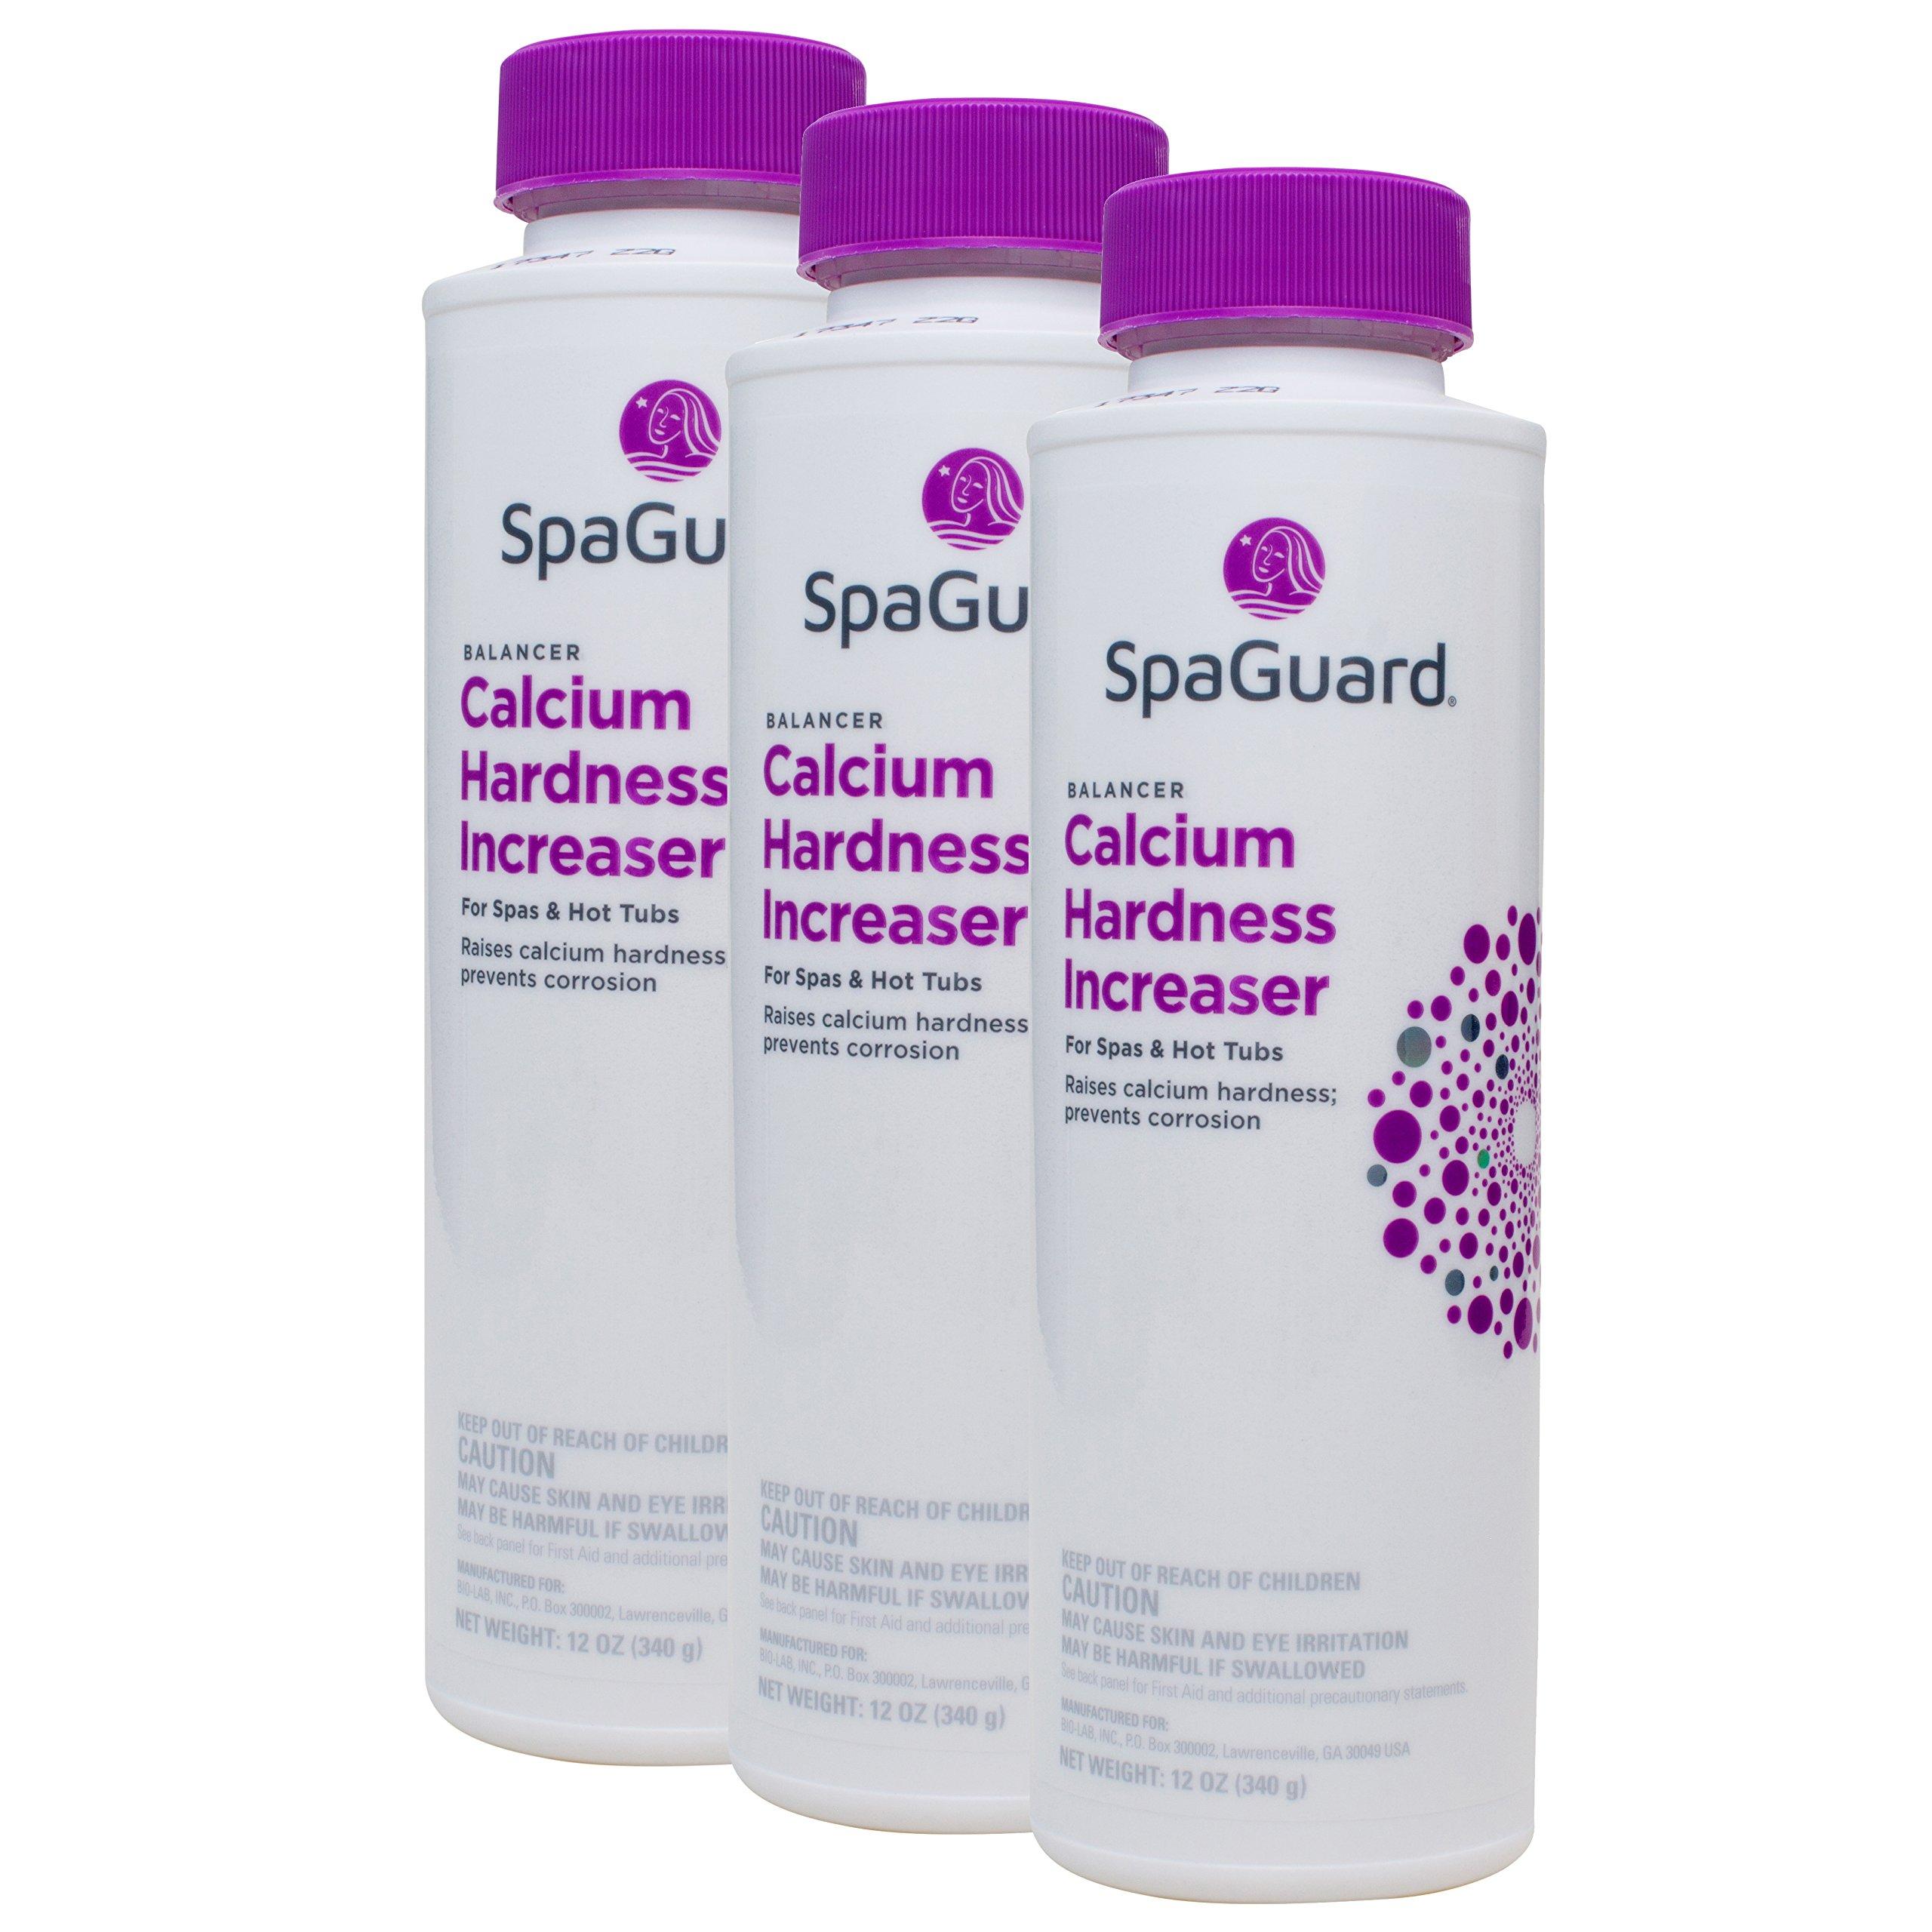 SpaGuard Spa Calcium Hardness Increaser (12 oz) (3 Pack)